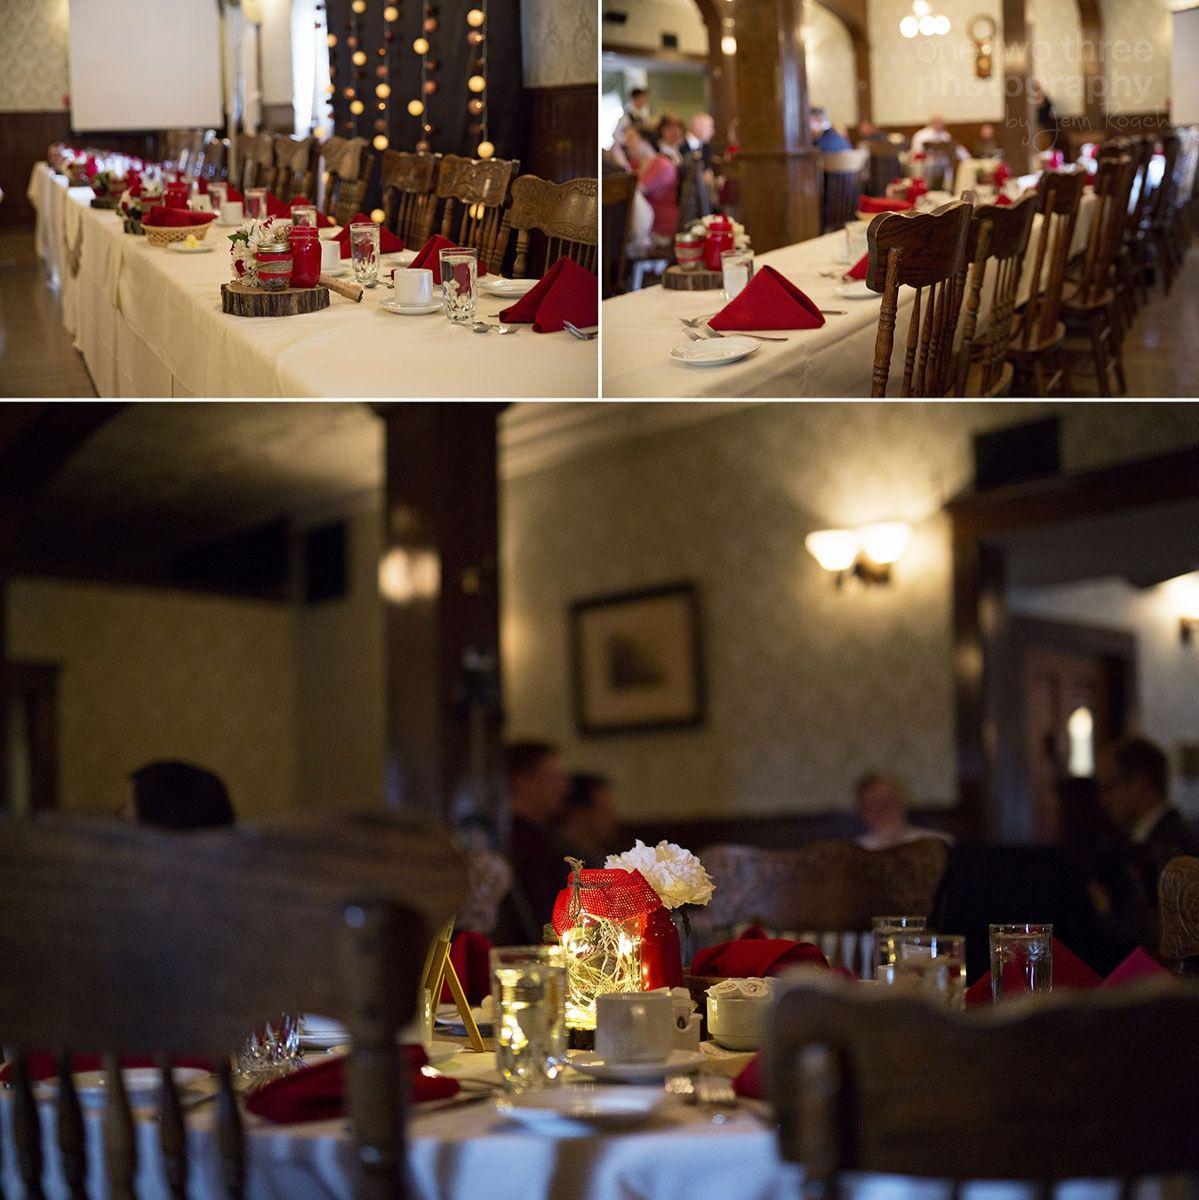 Outdoor Wedding Ceremony Calgary: Wedding At The Wainwright Hotel In Heritage Park